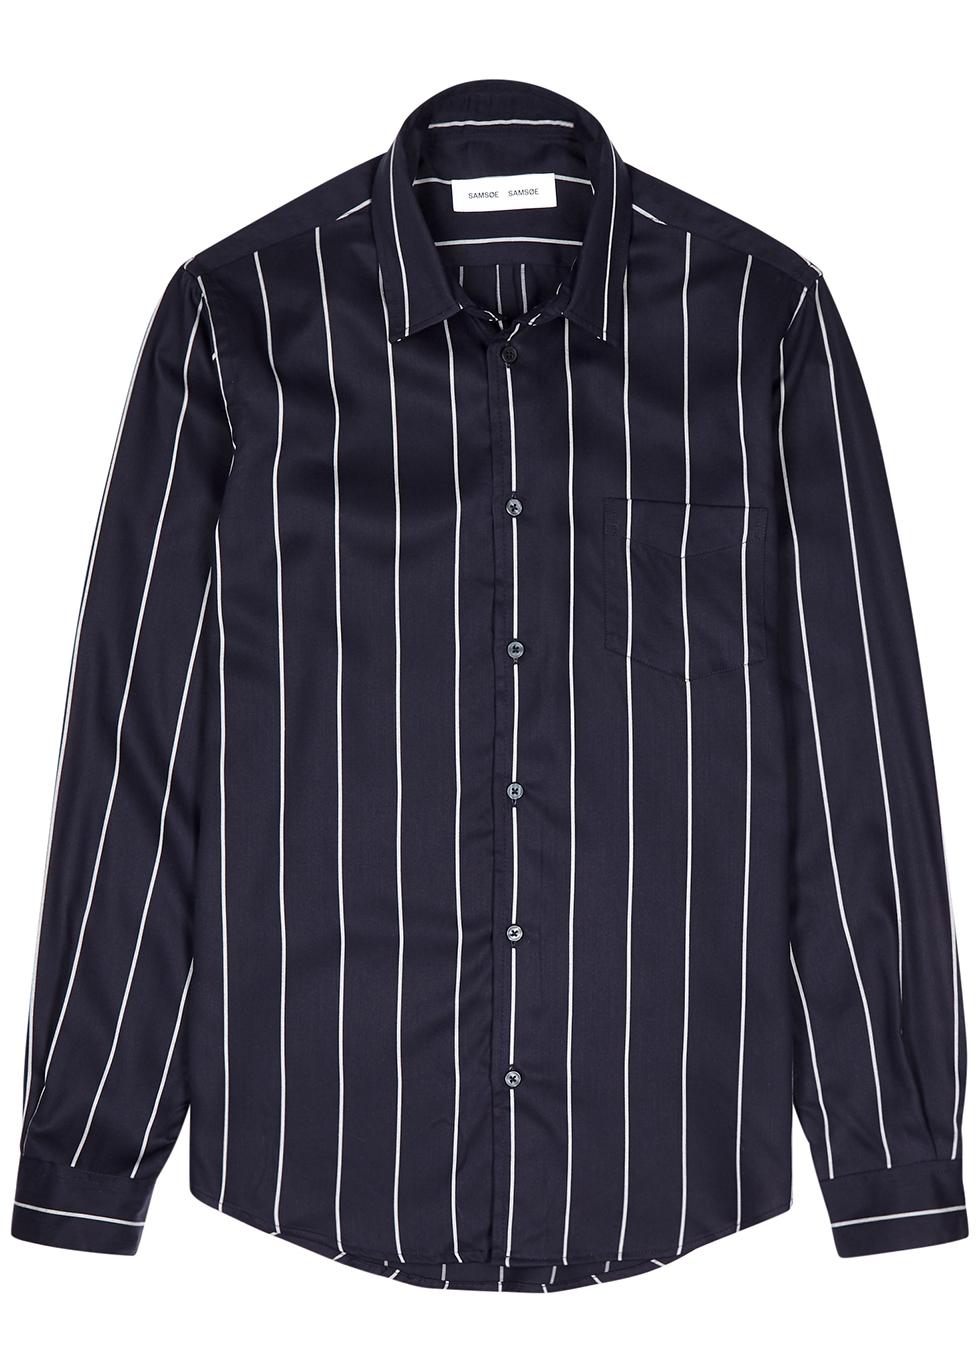 Navy striped woven shirt